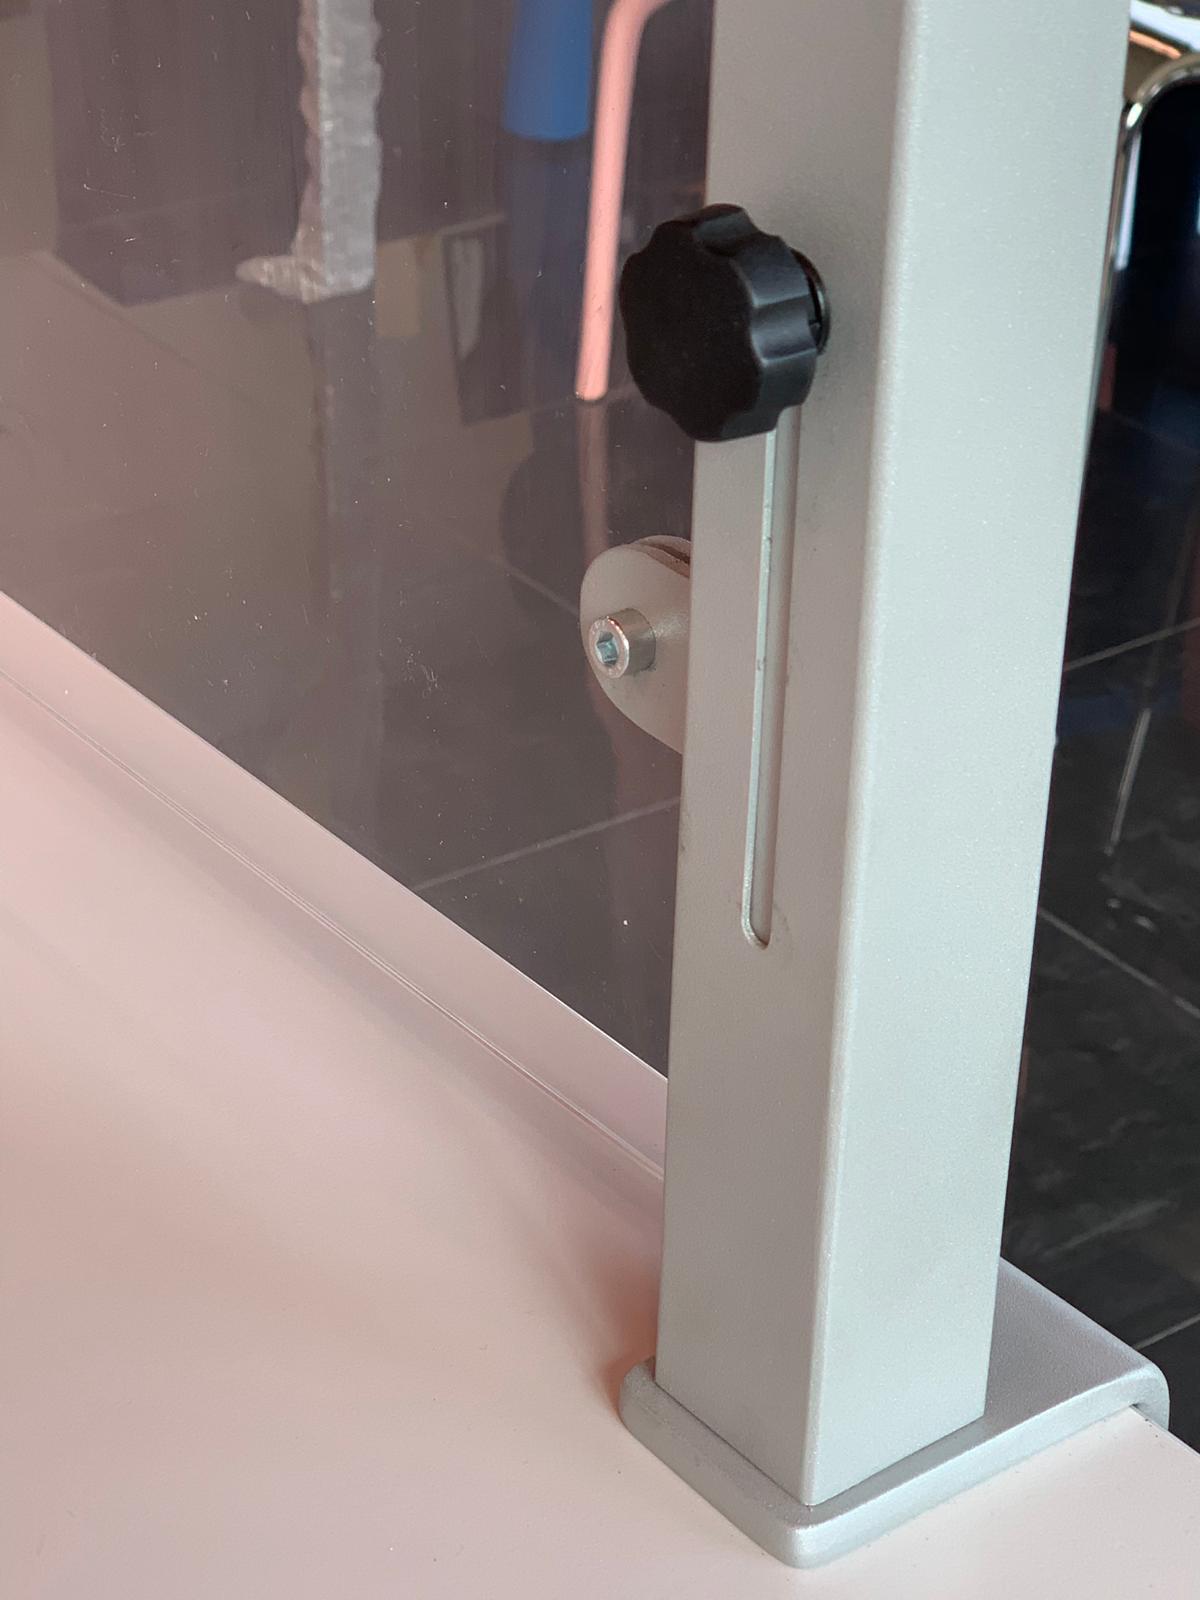 Divisori In Plexiglass Per Esterni vendita online schermi divisori di protezione in plexiglass